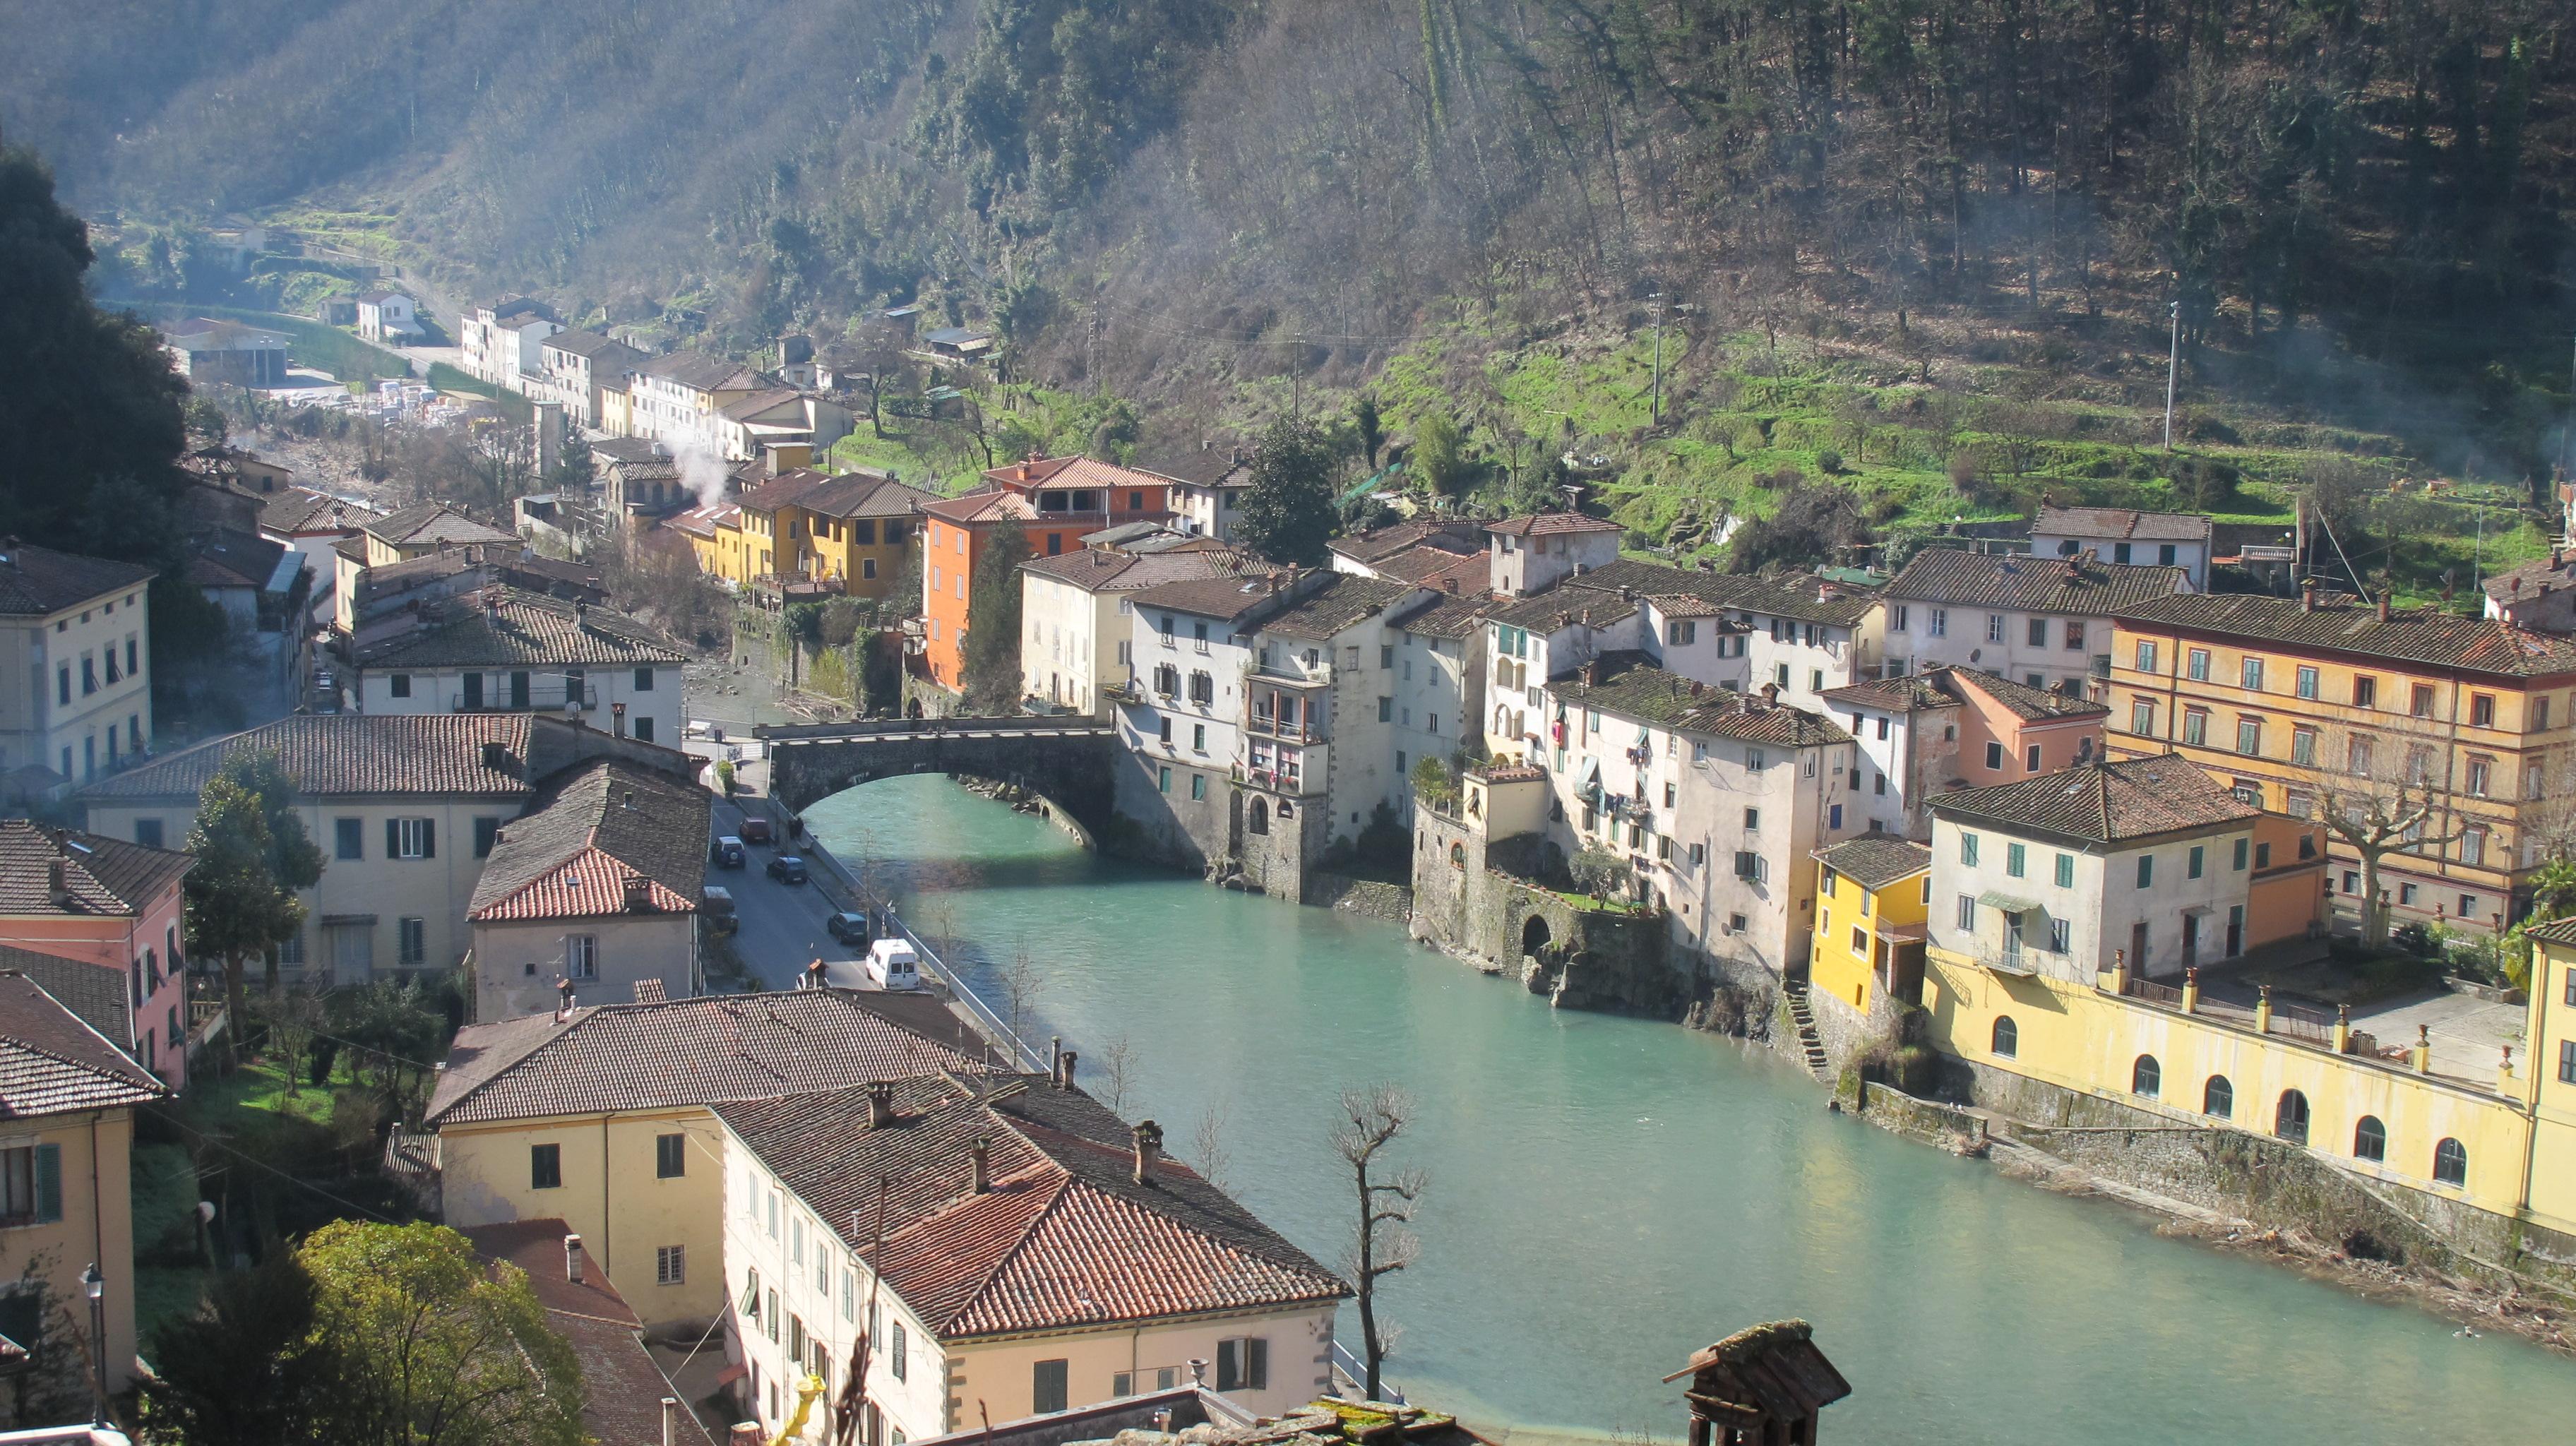 Ponte a serraglio february bagni di lucca and beyond - Bagno di lucca ...